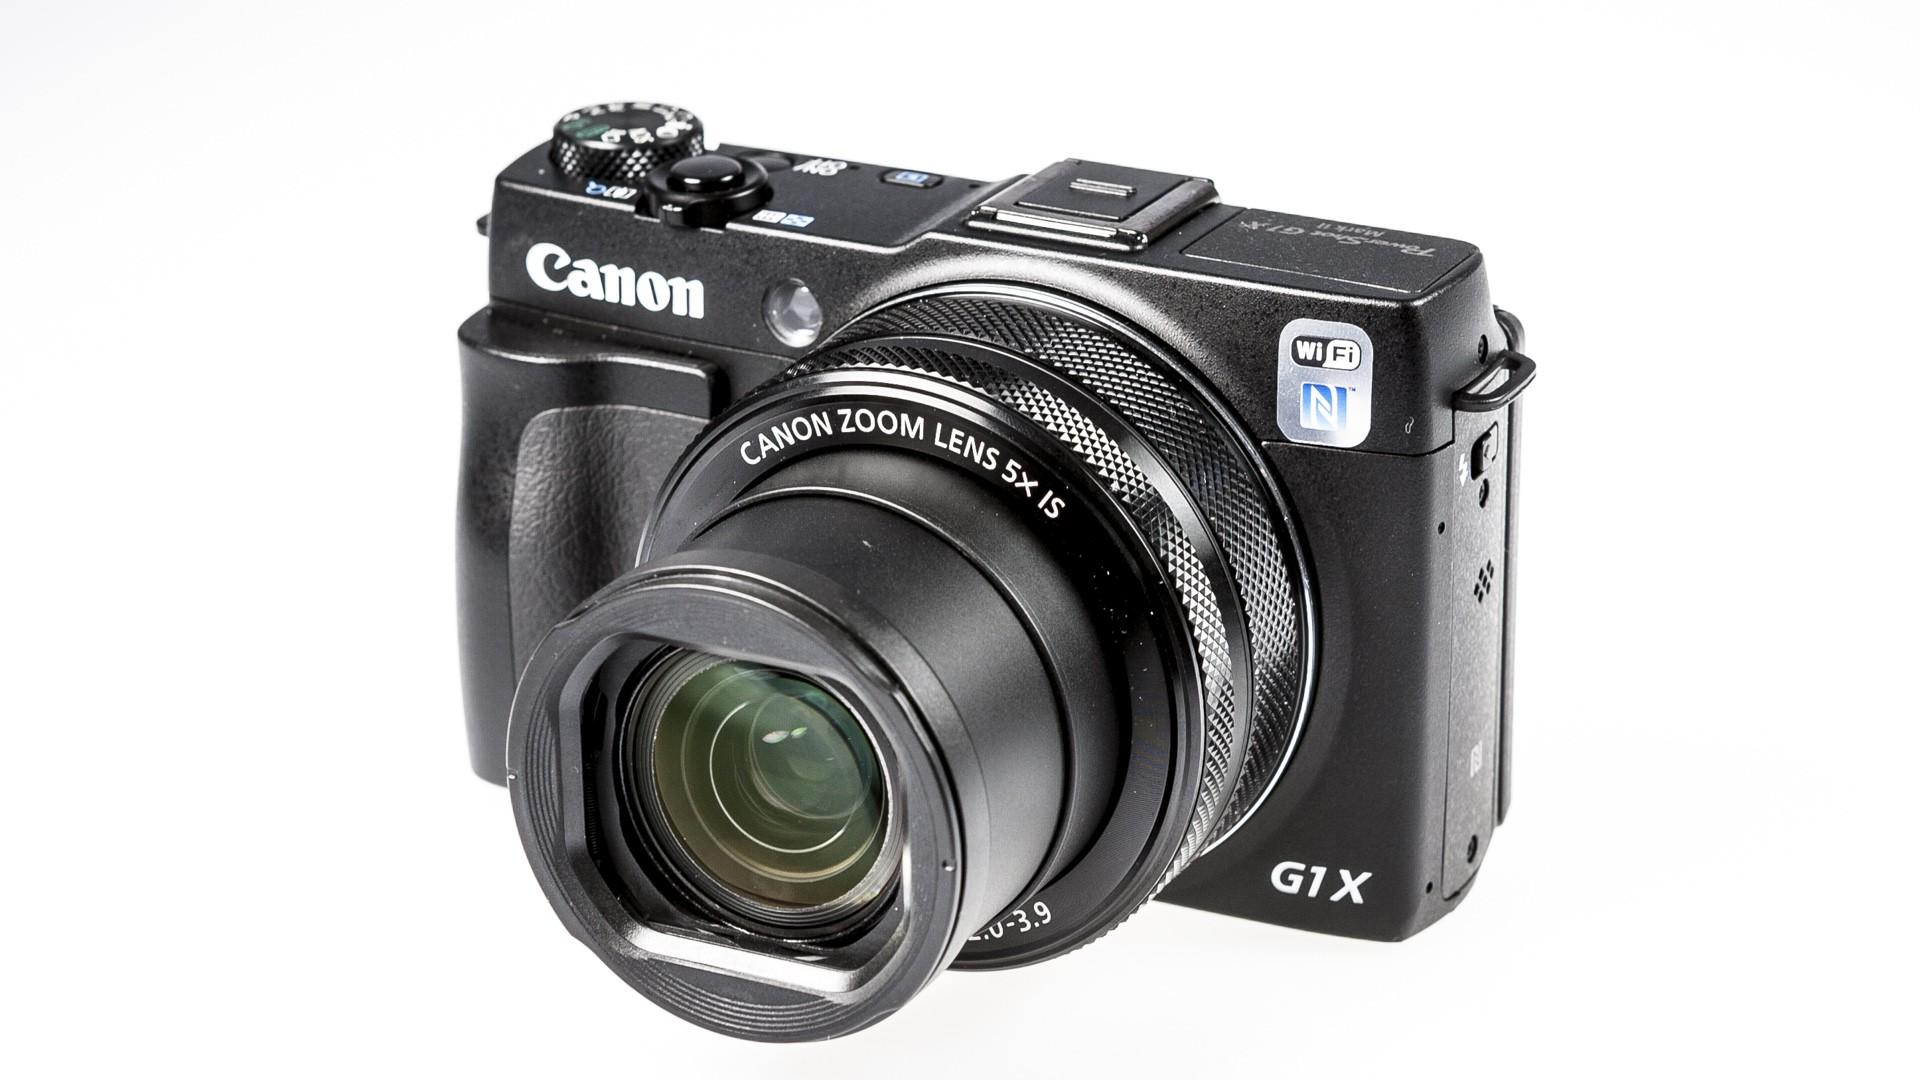 Canon PowerShot G1 X Mark II : Test complet